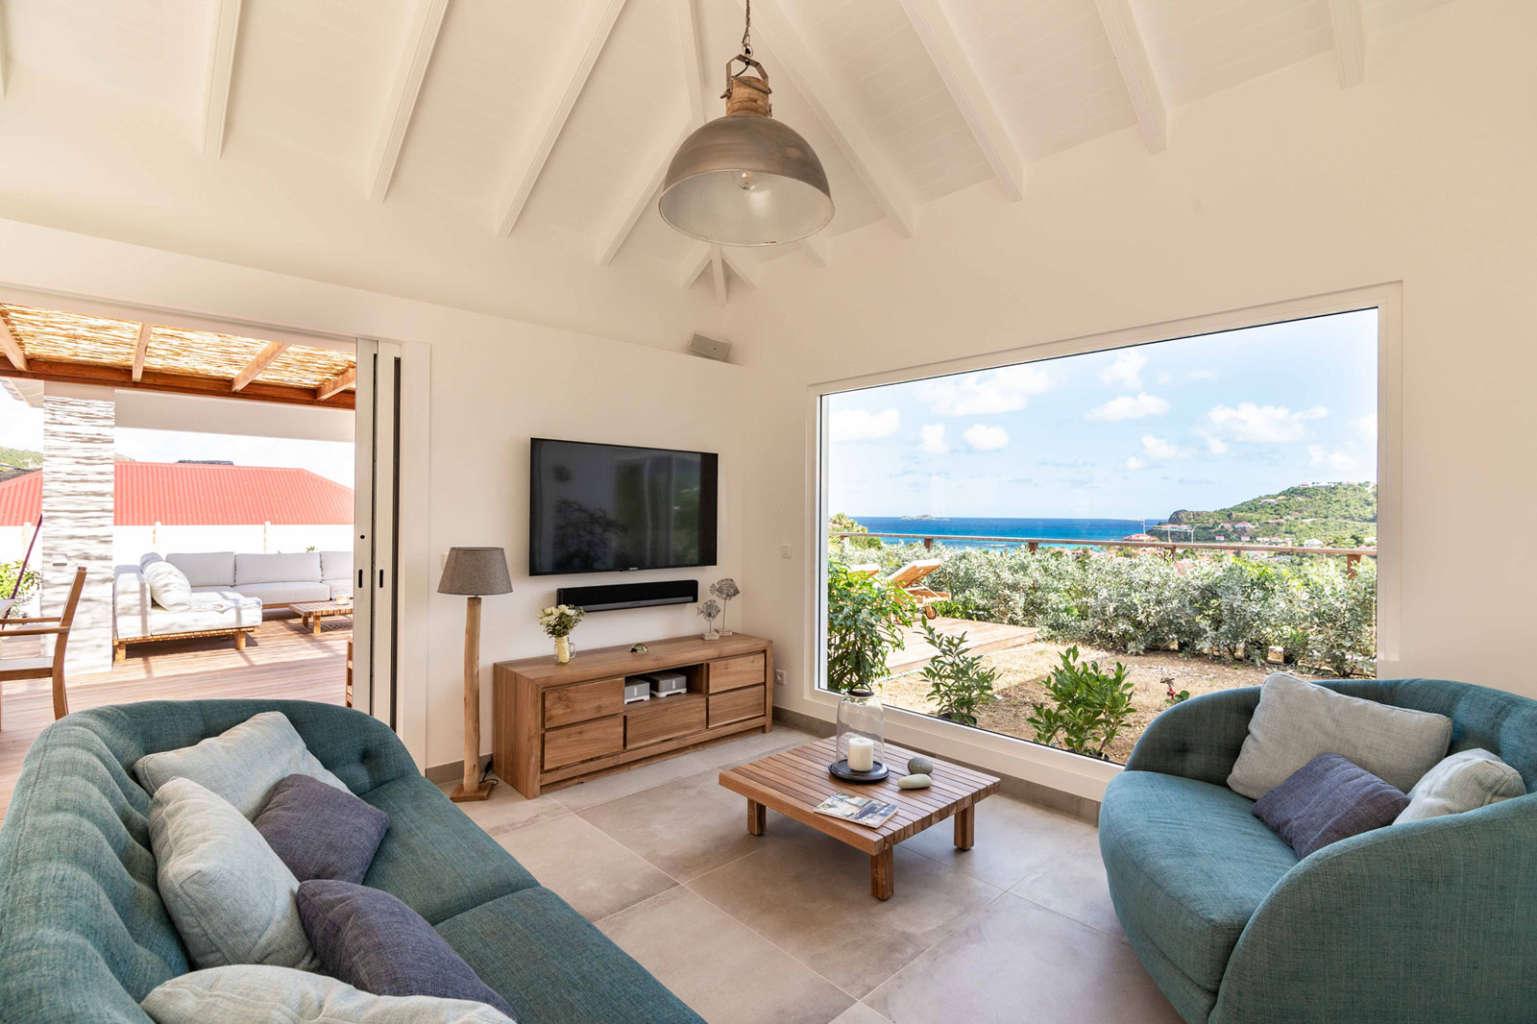 Villa Au Paille En Queue - 2 Bedroom Villa for Rent with Pool - Living room